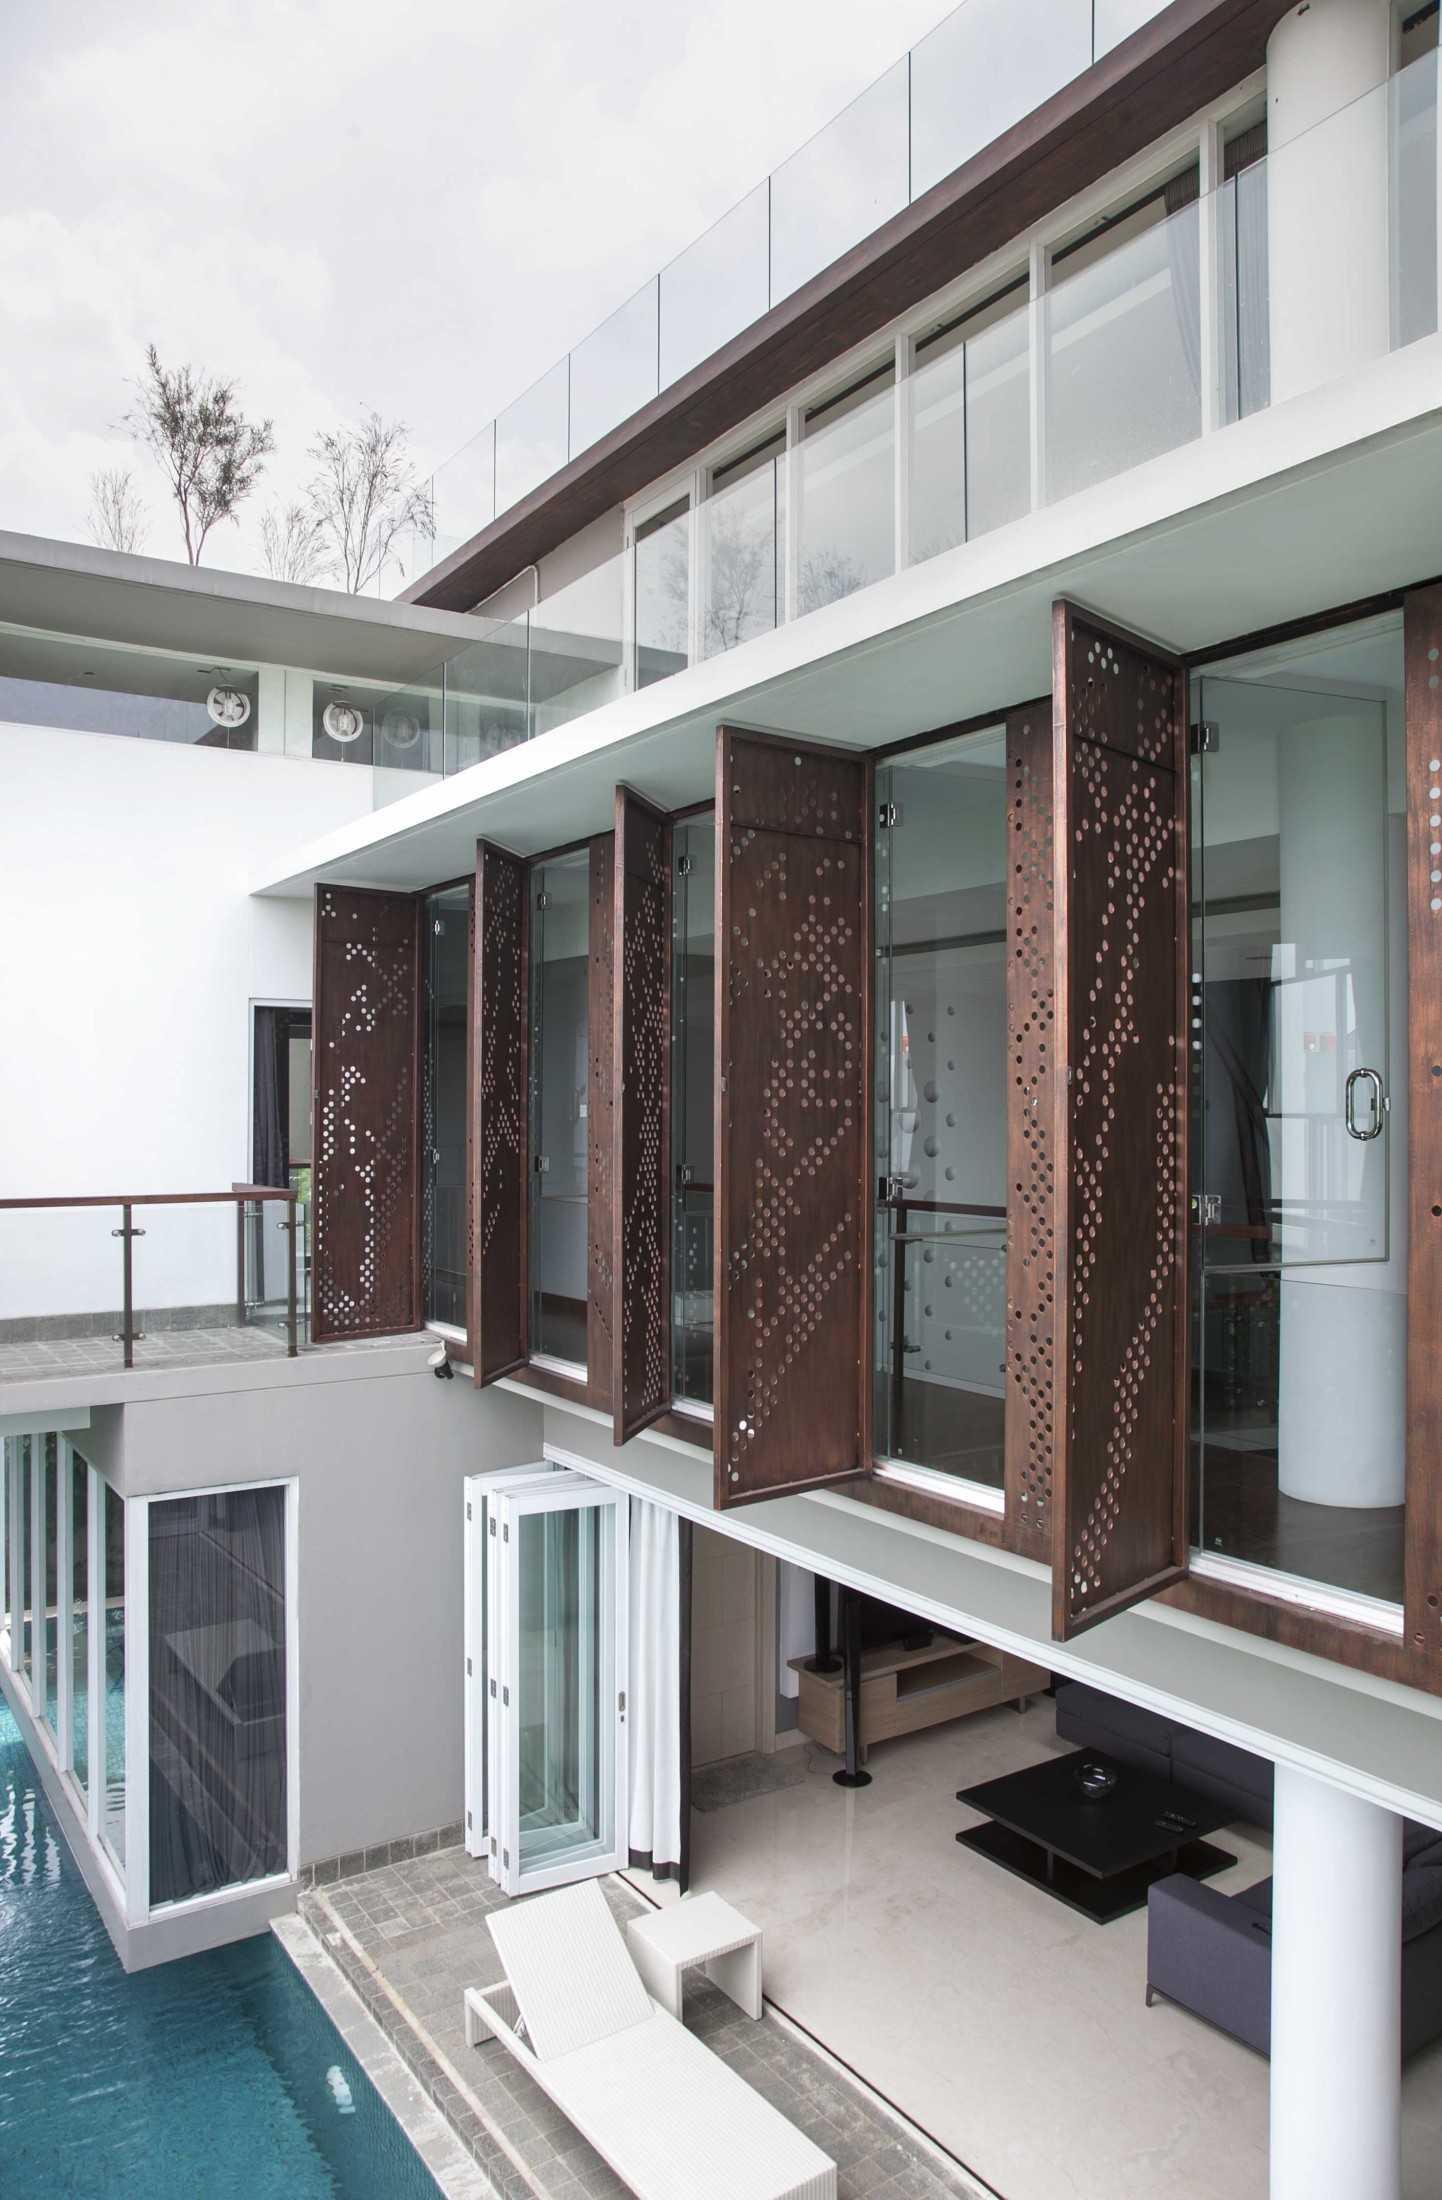 Wastu Cipta Parama Permata Buana House Jakarta, Daerah Khusus Ibukota Jakarta, Indonesia Jakarta, Daerah Khusus Ibukota Jakarta, Indonesia Fasad  79020